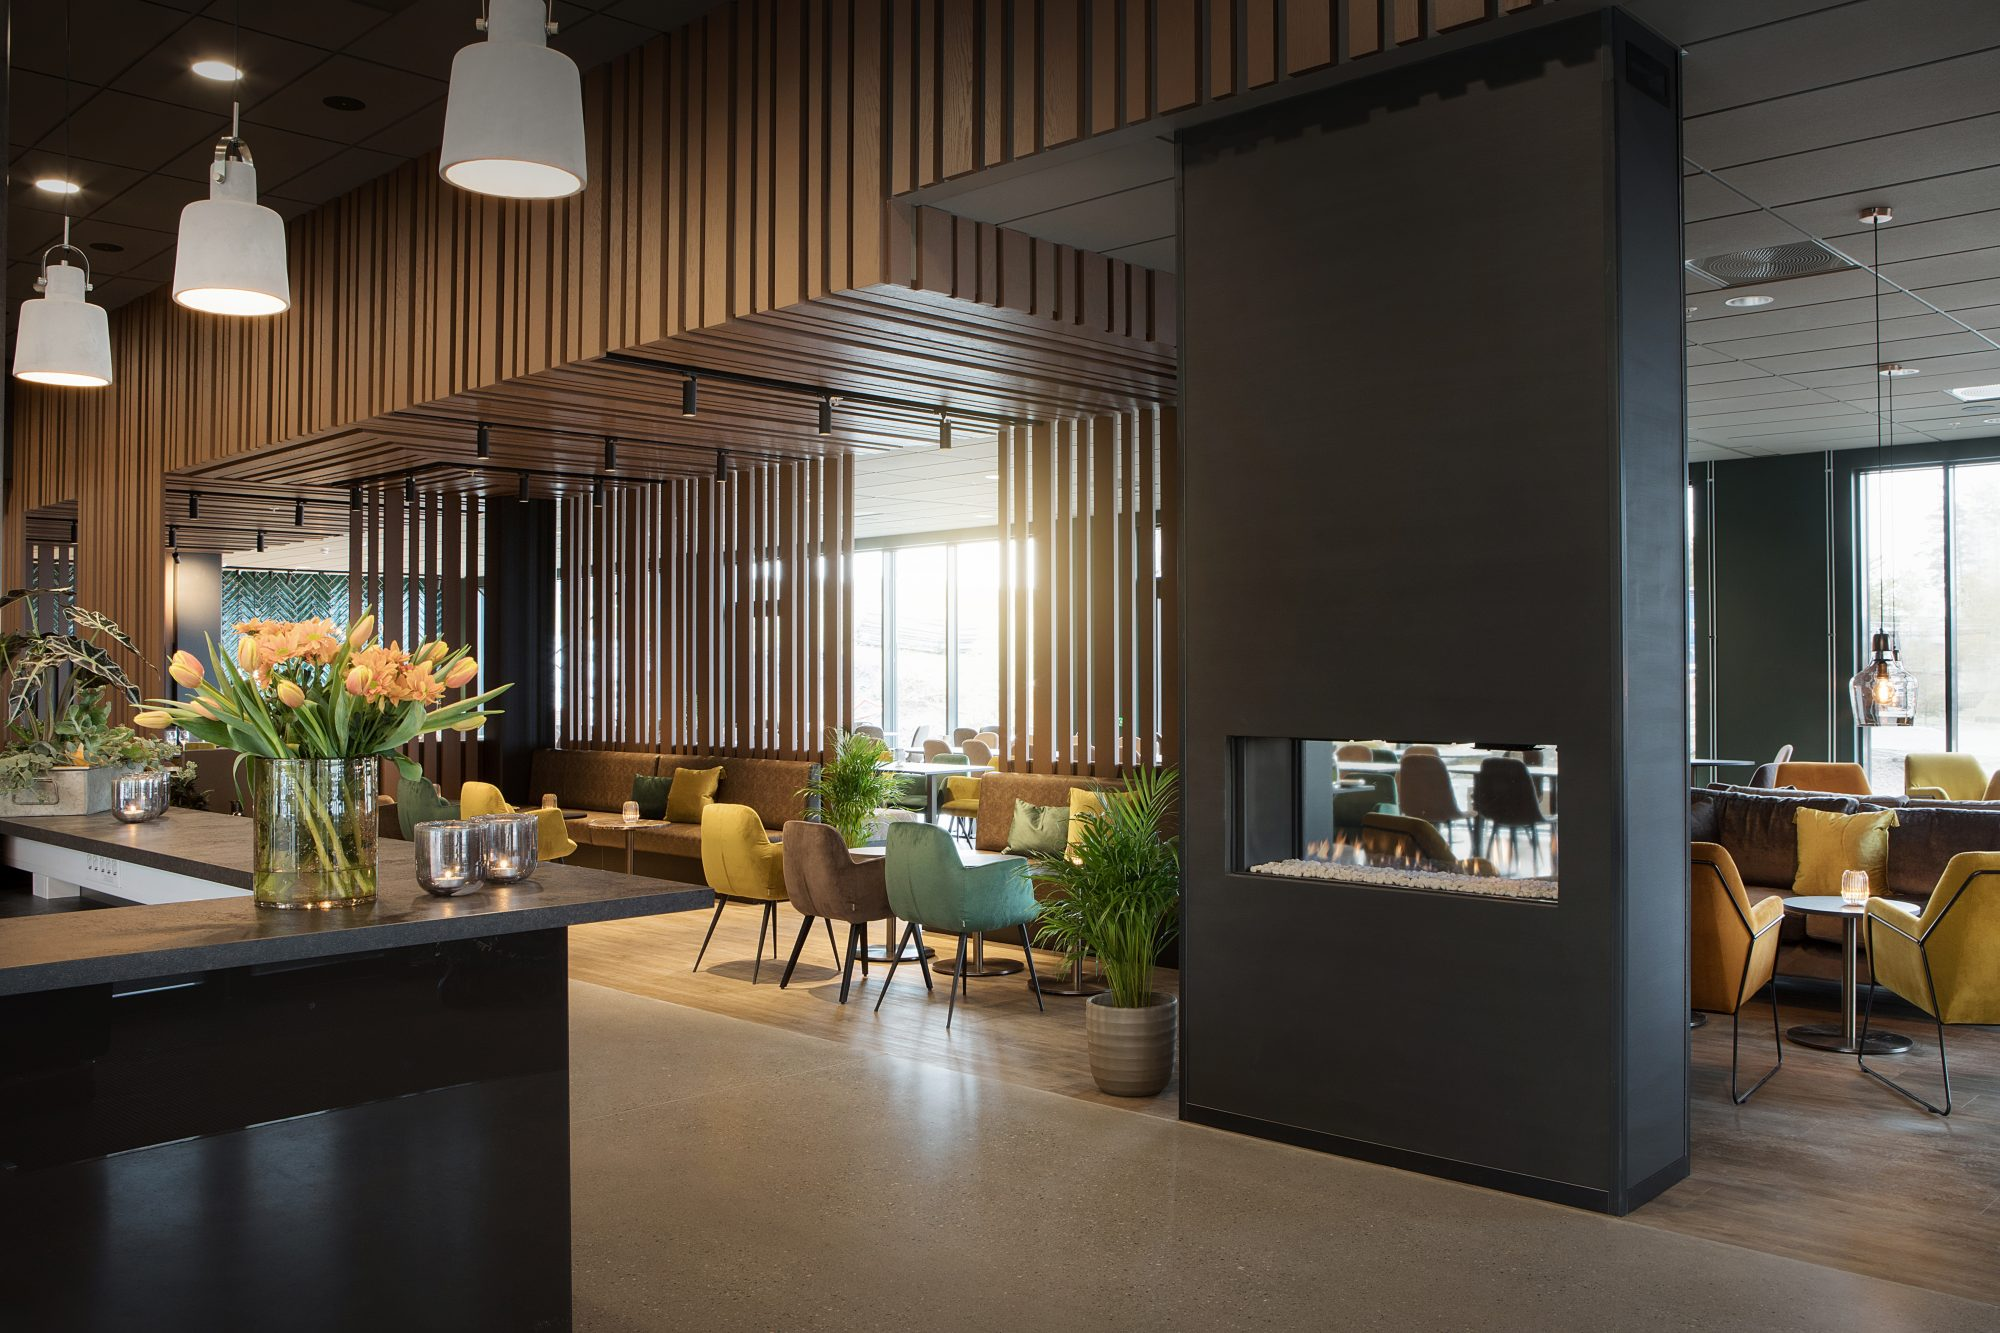 Scandic_Brennemoen_Reception_Lobby_fireplace_1